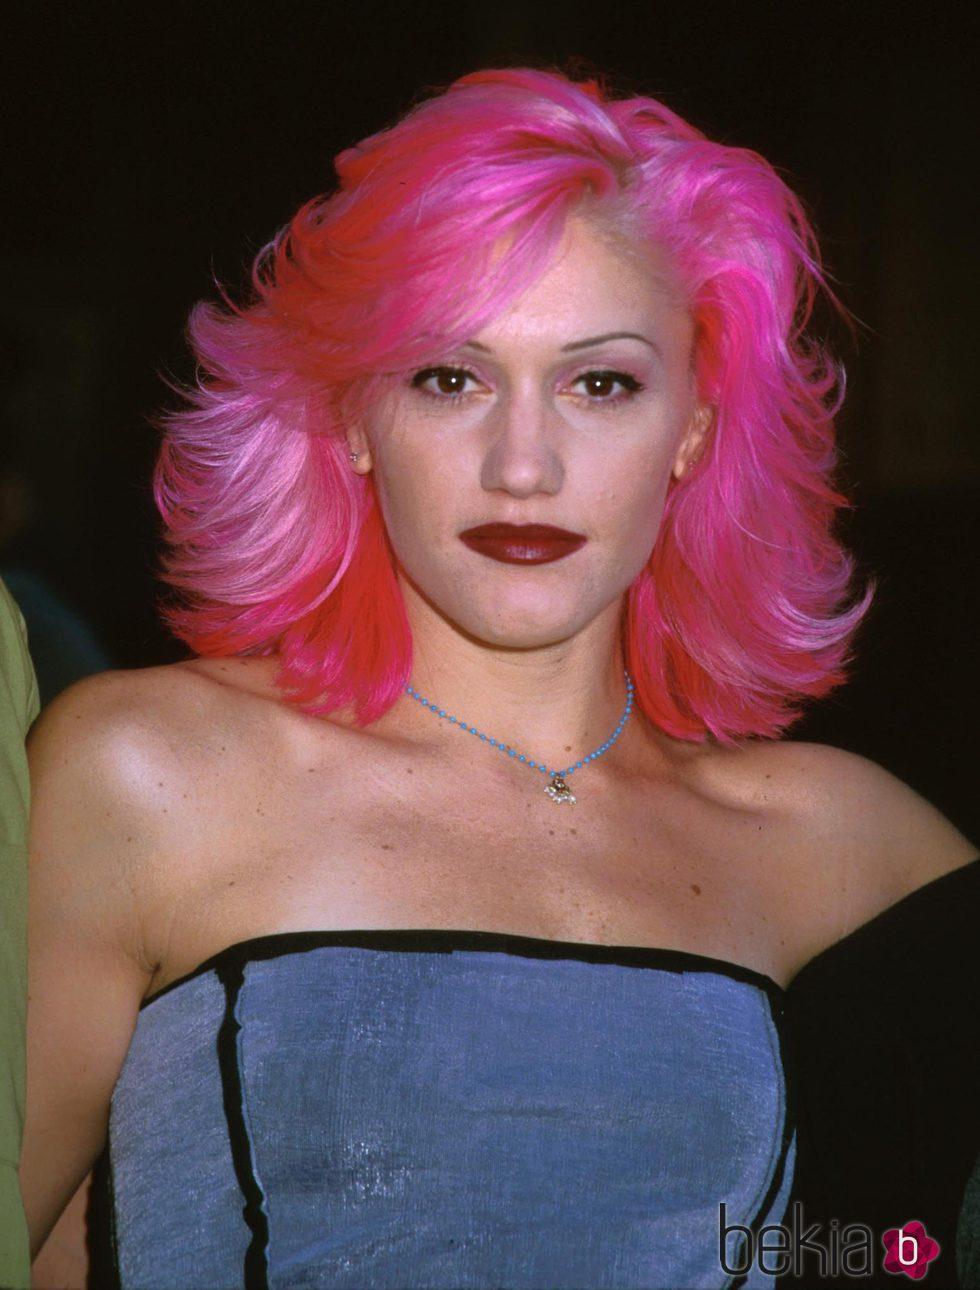 Gwen Stefani en el Annual Artist Direct Online Music Awards en 1999